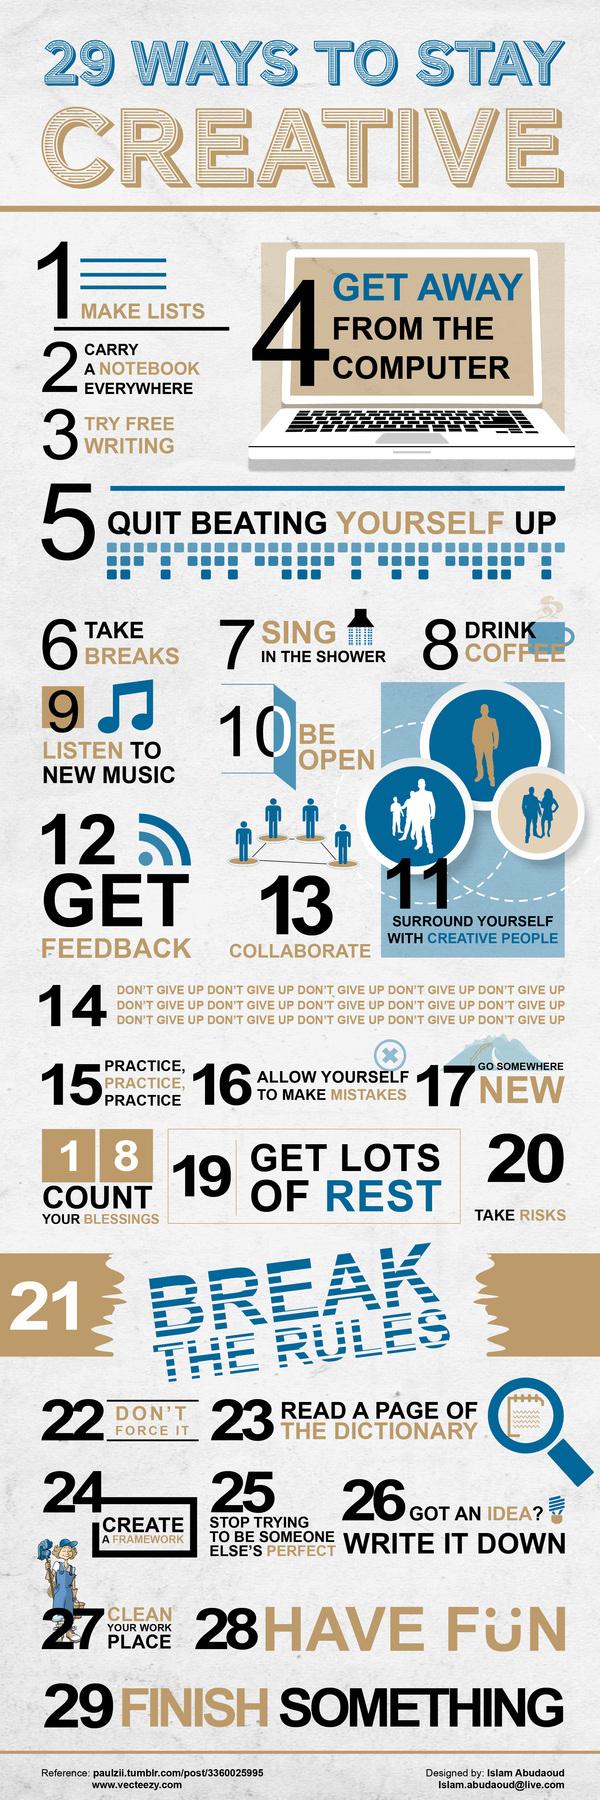 image from s3-ec.buzzfed.com